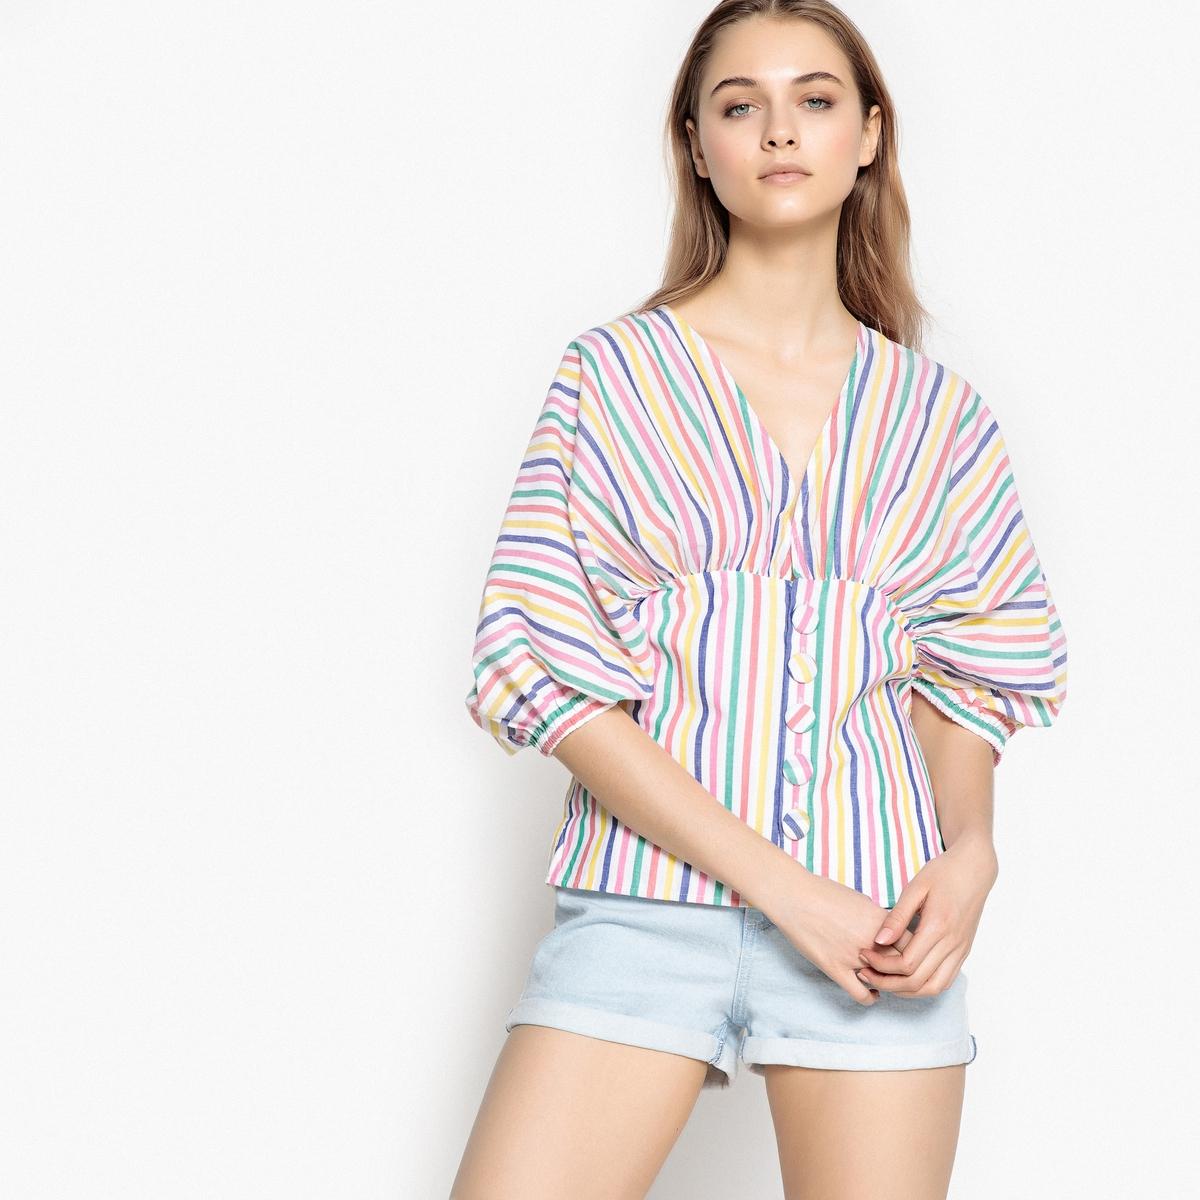 Camisa com mangas amplas, riscas multicolores